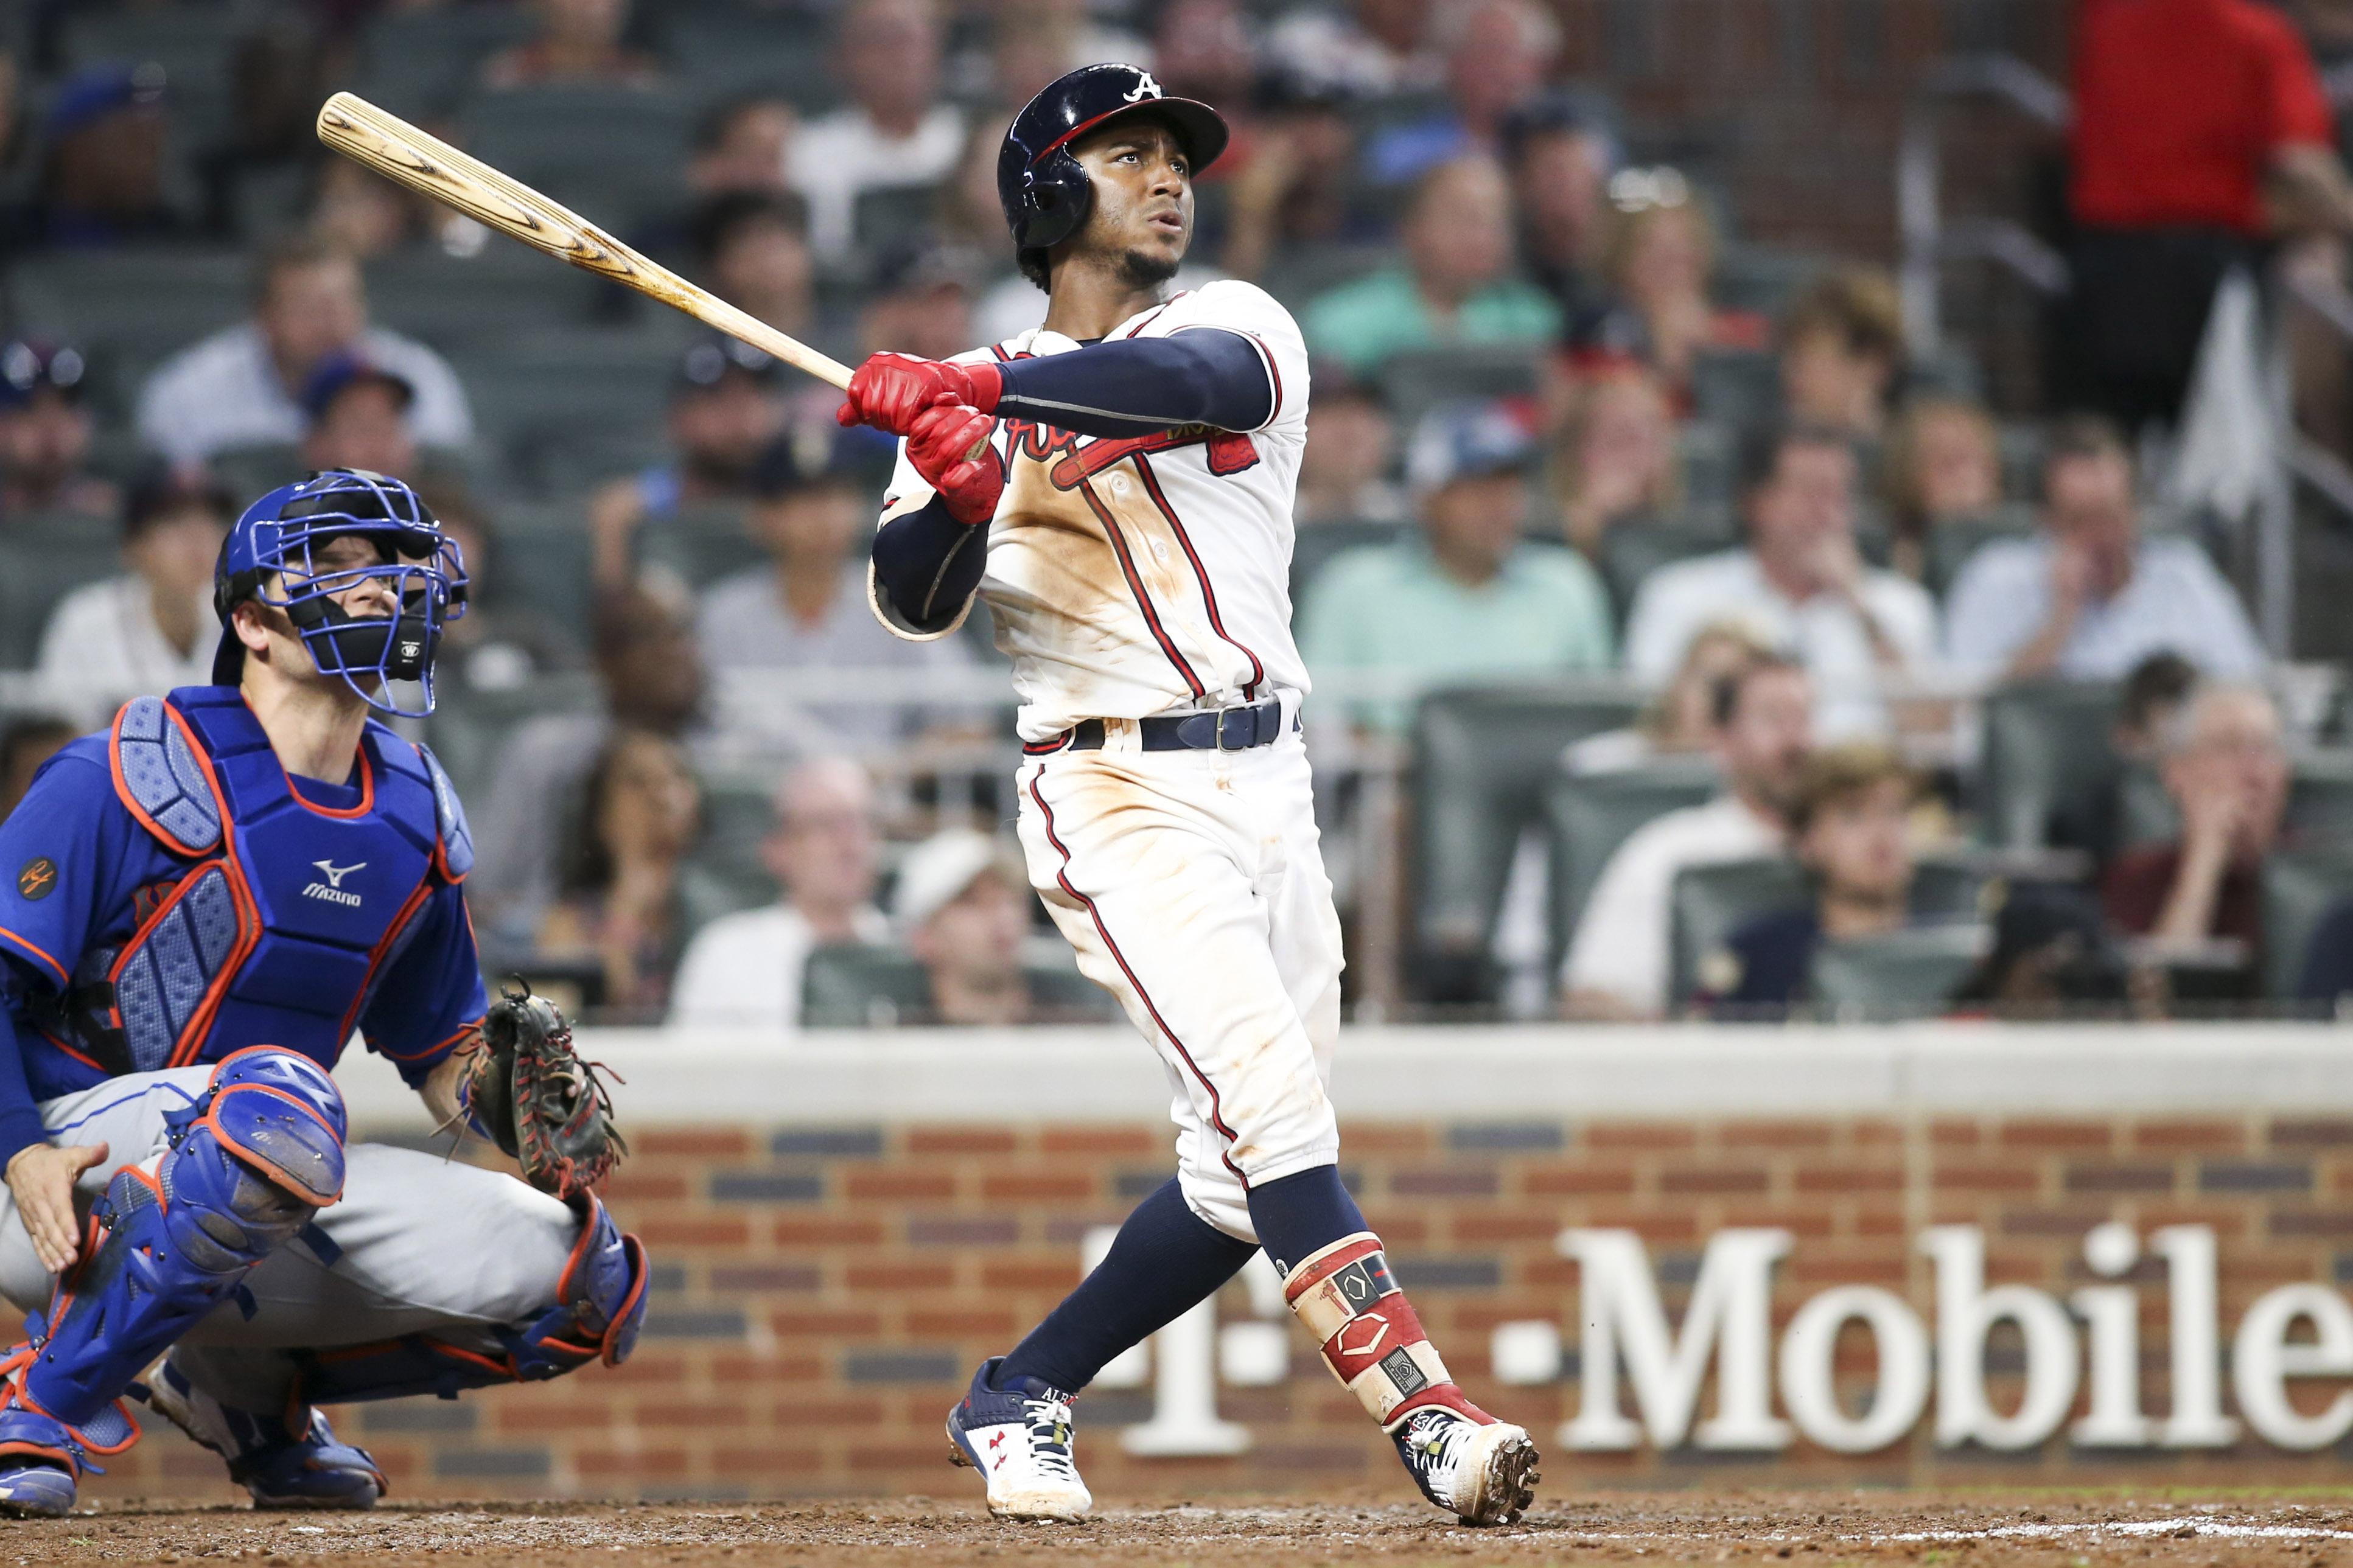 6/13/18 Game Preview: New York Mets at Atlanta Braves